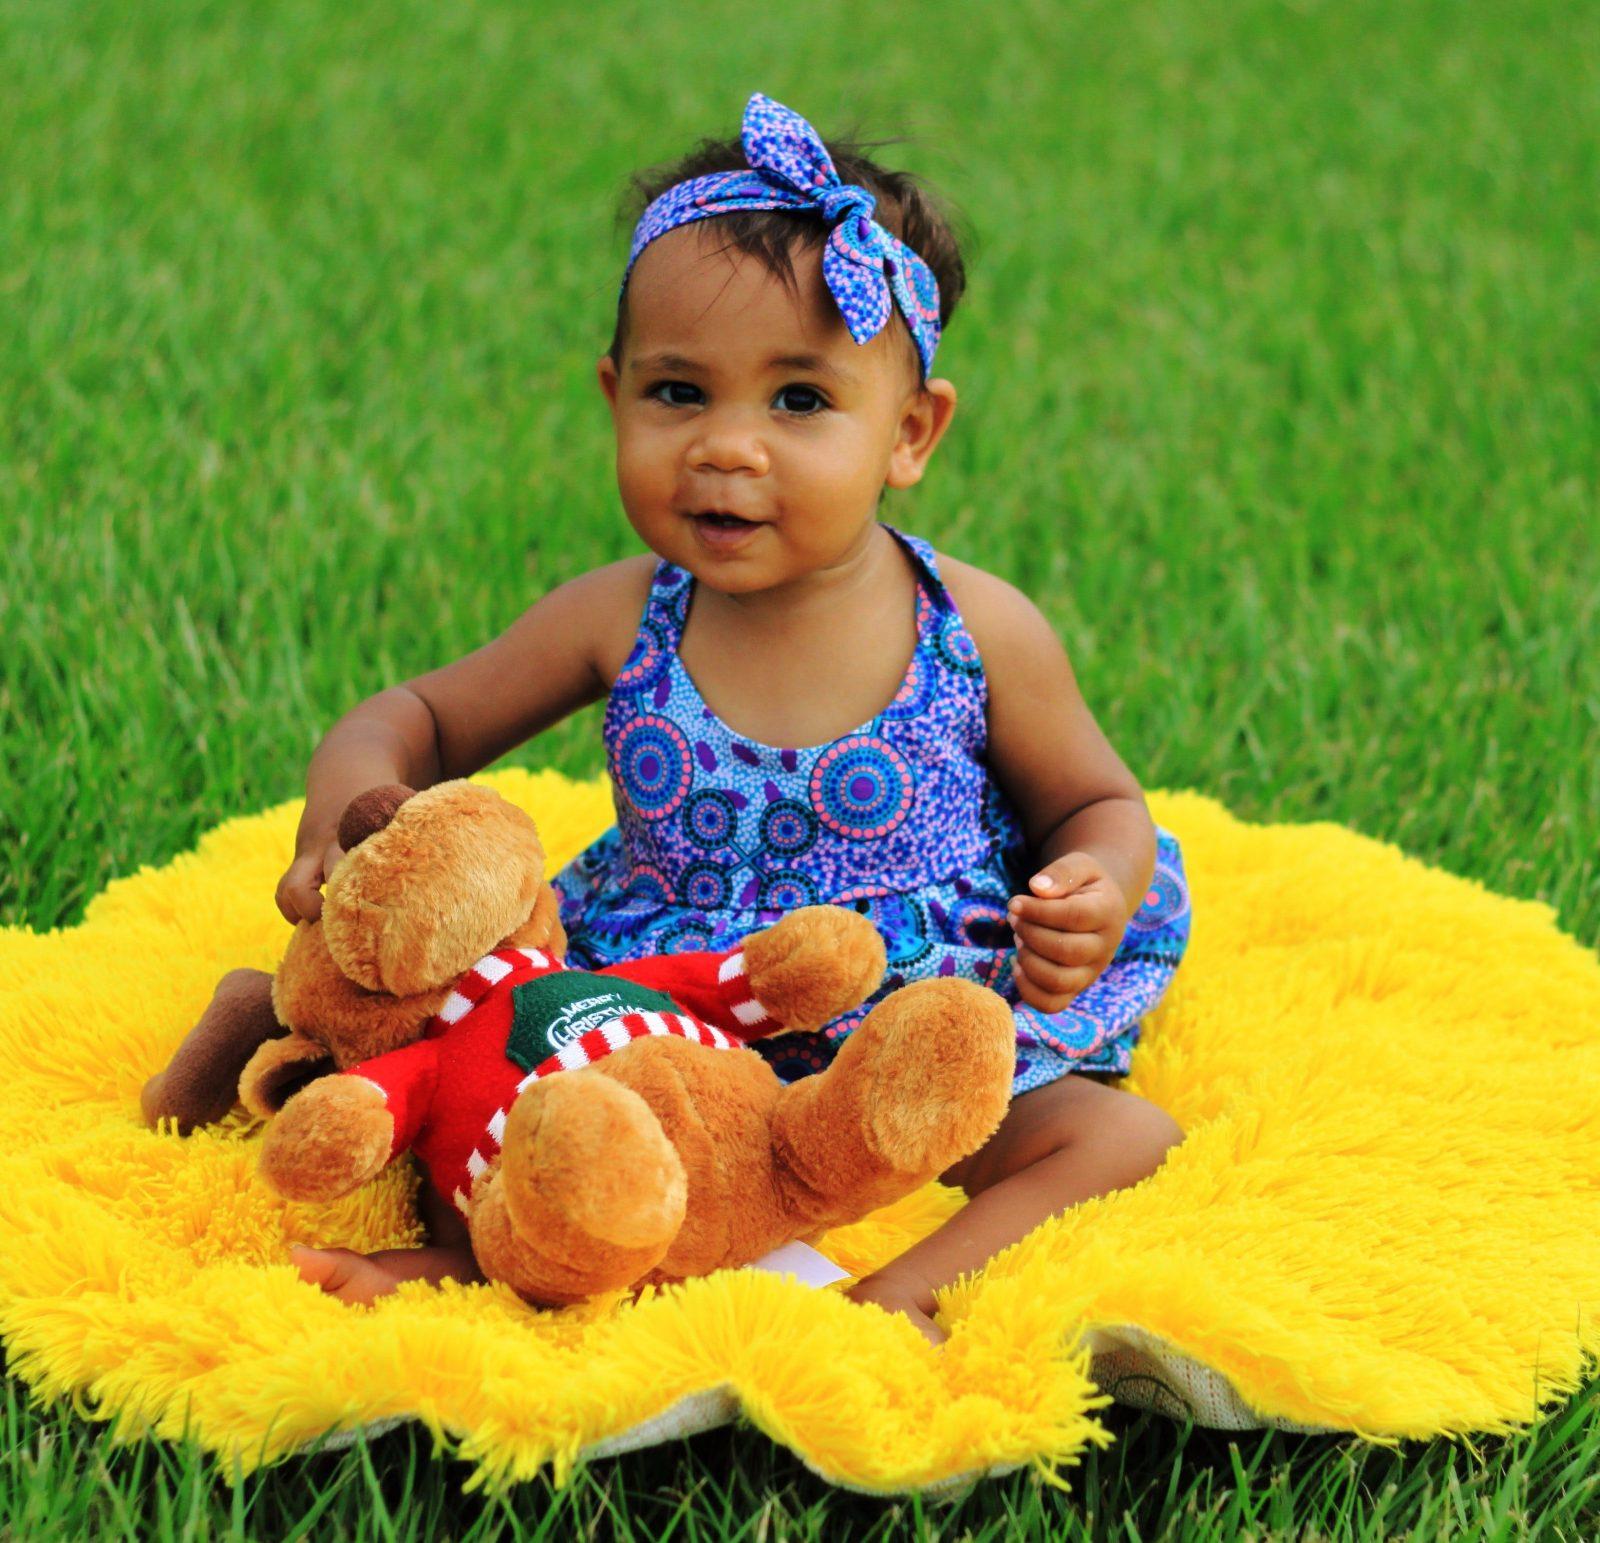 Tailfeathers Baby Wear